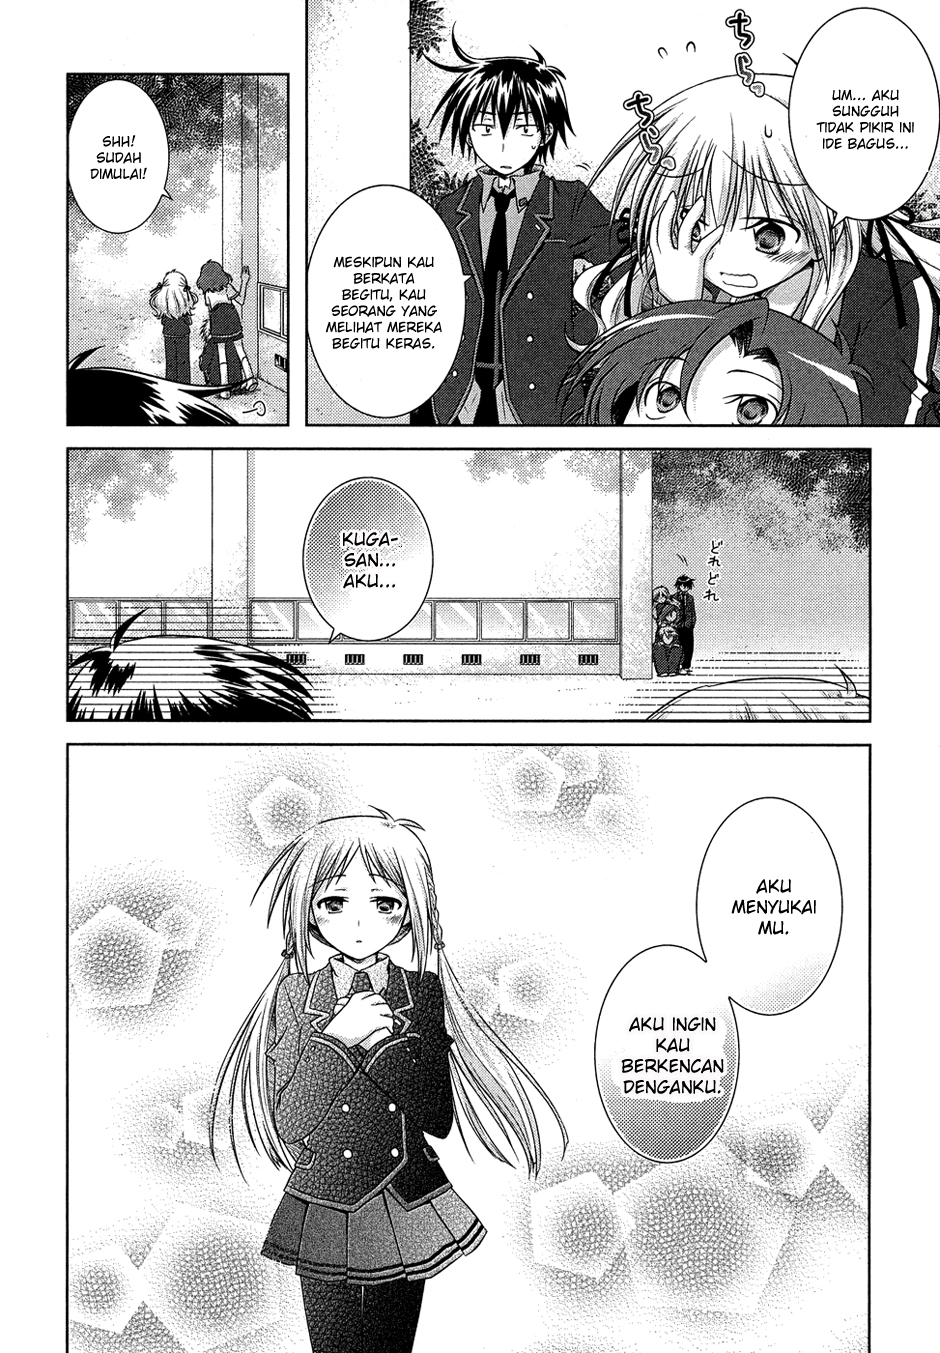 Komik iris zero 0010 11 Indonesia iris zero 0010 Terbaru 8|Baca Manga Komik Indonesia|